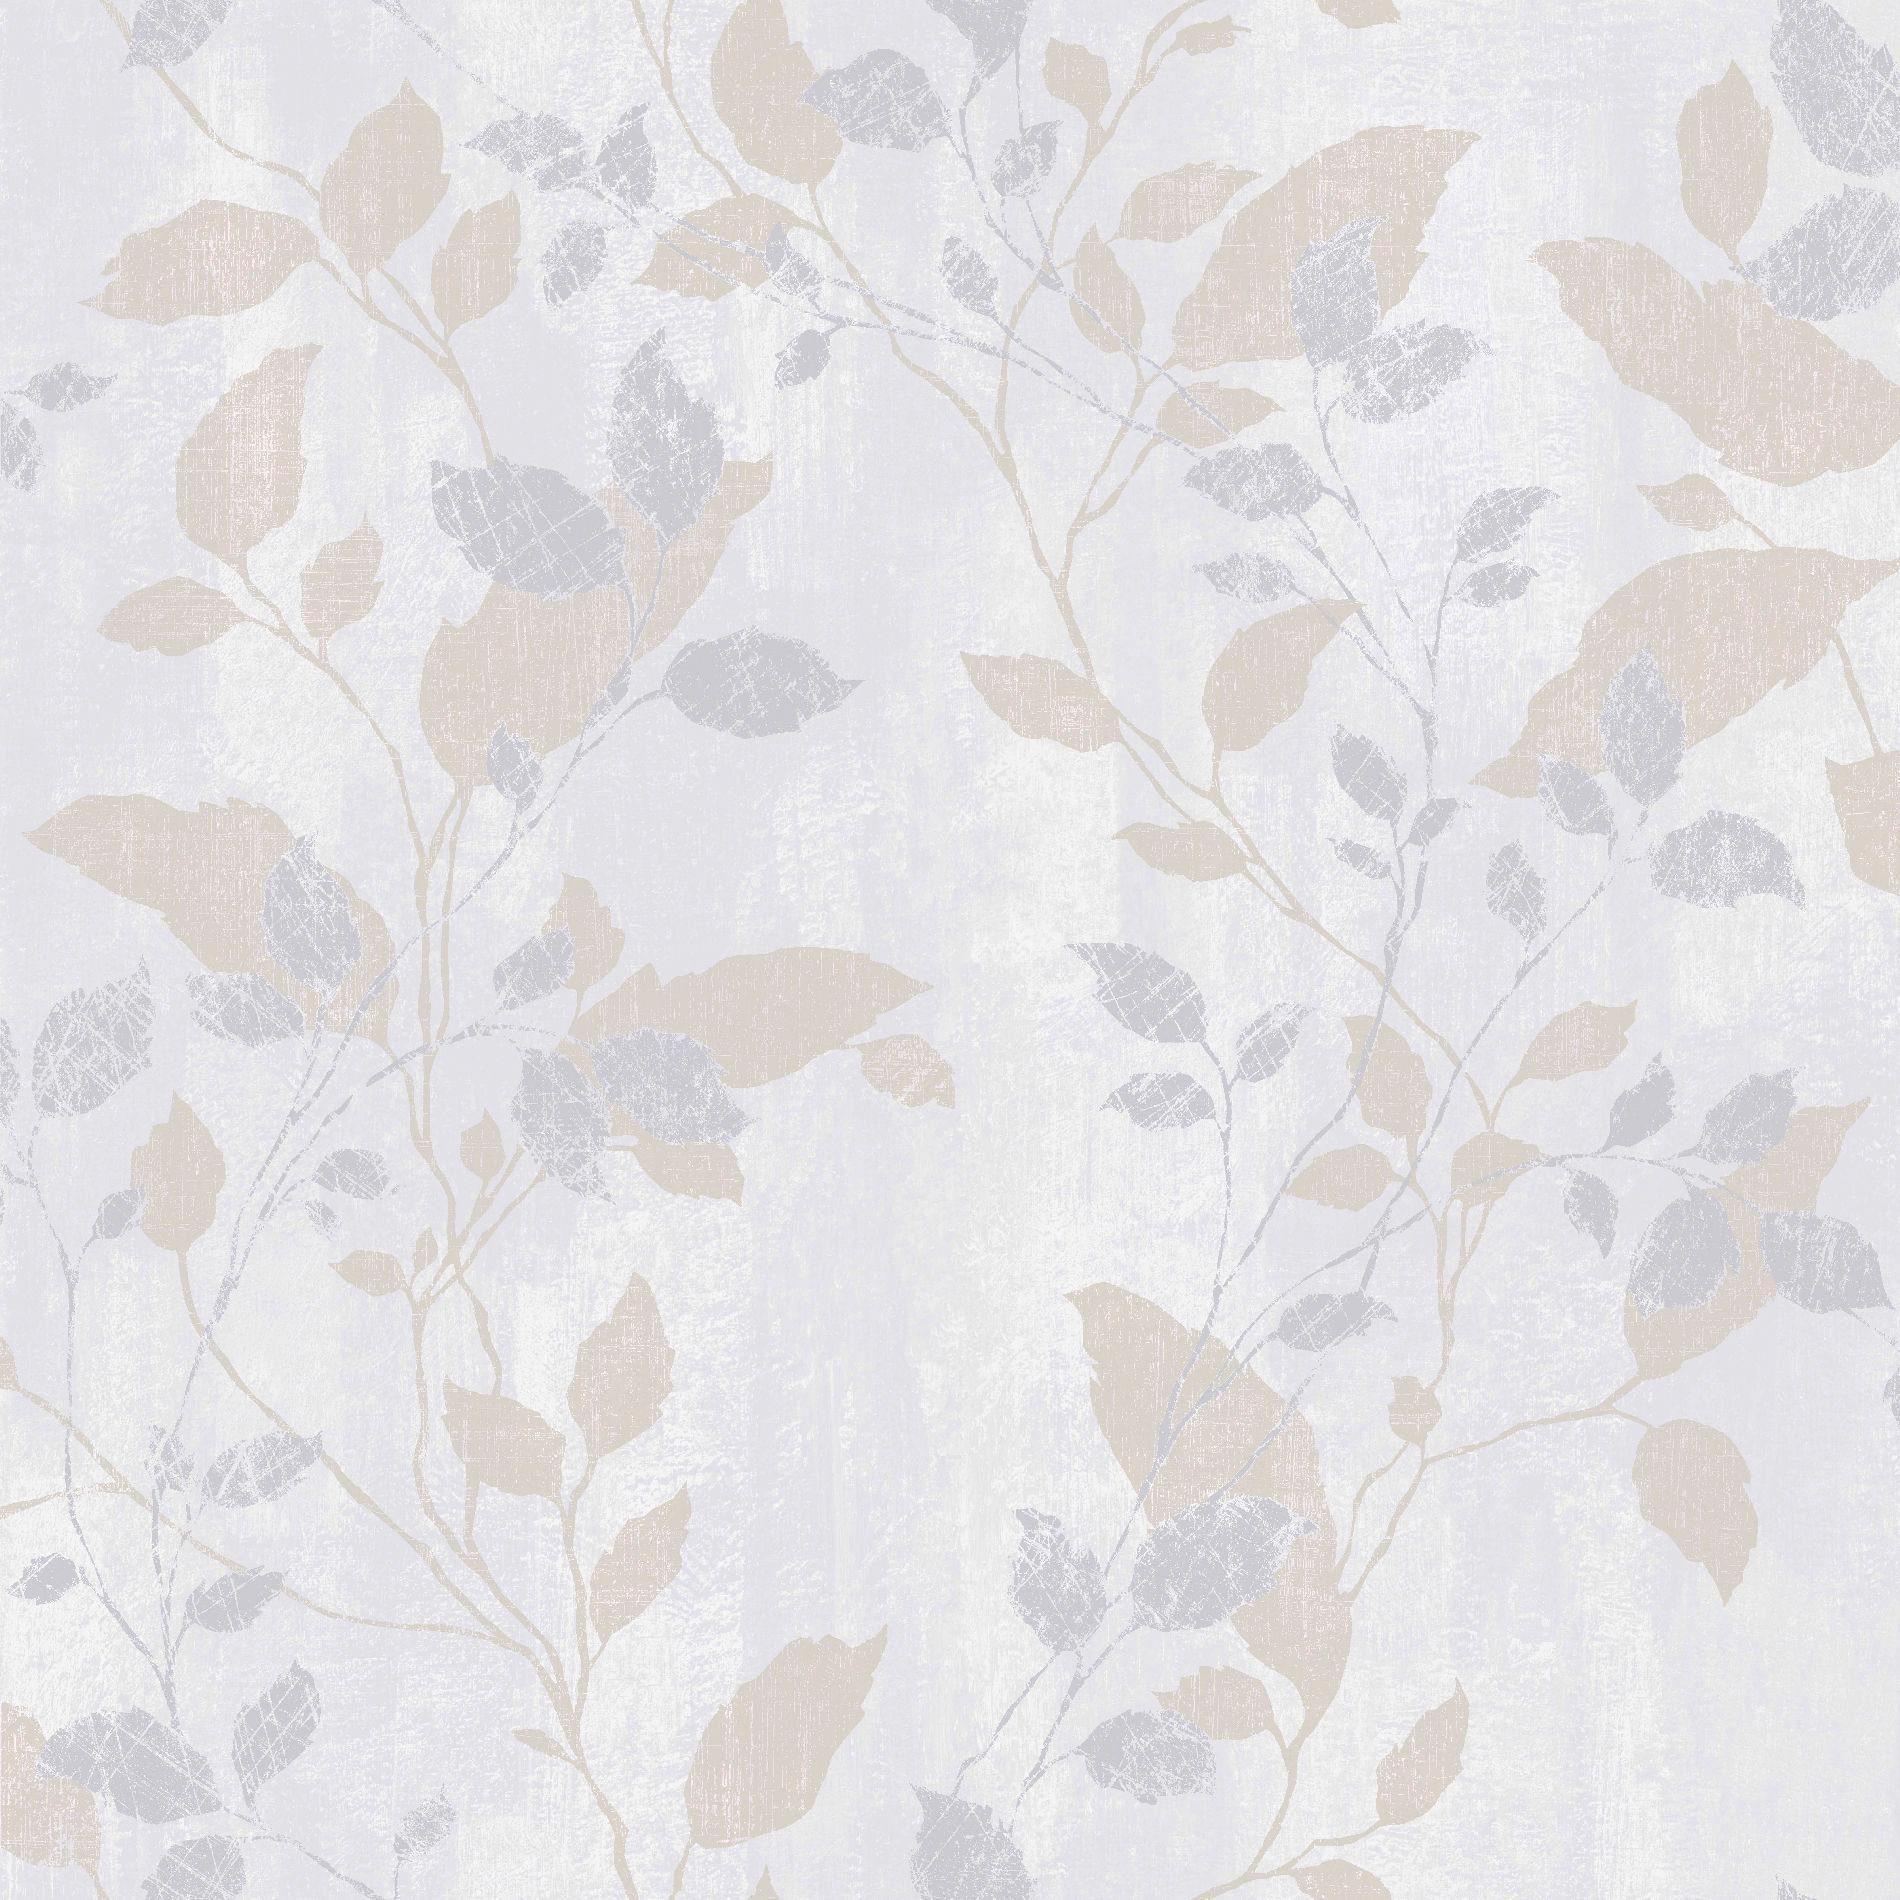 GRAHAM & BROWN Vliestapete »Leaf«, 1000 cm Länge